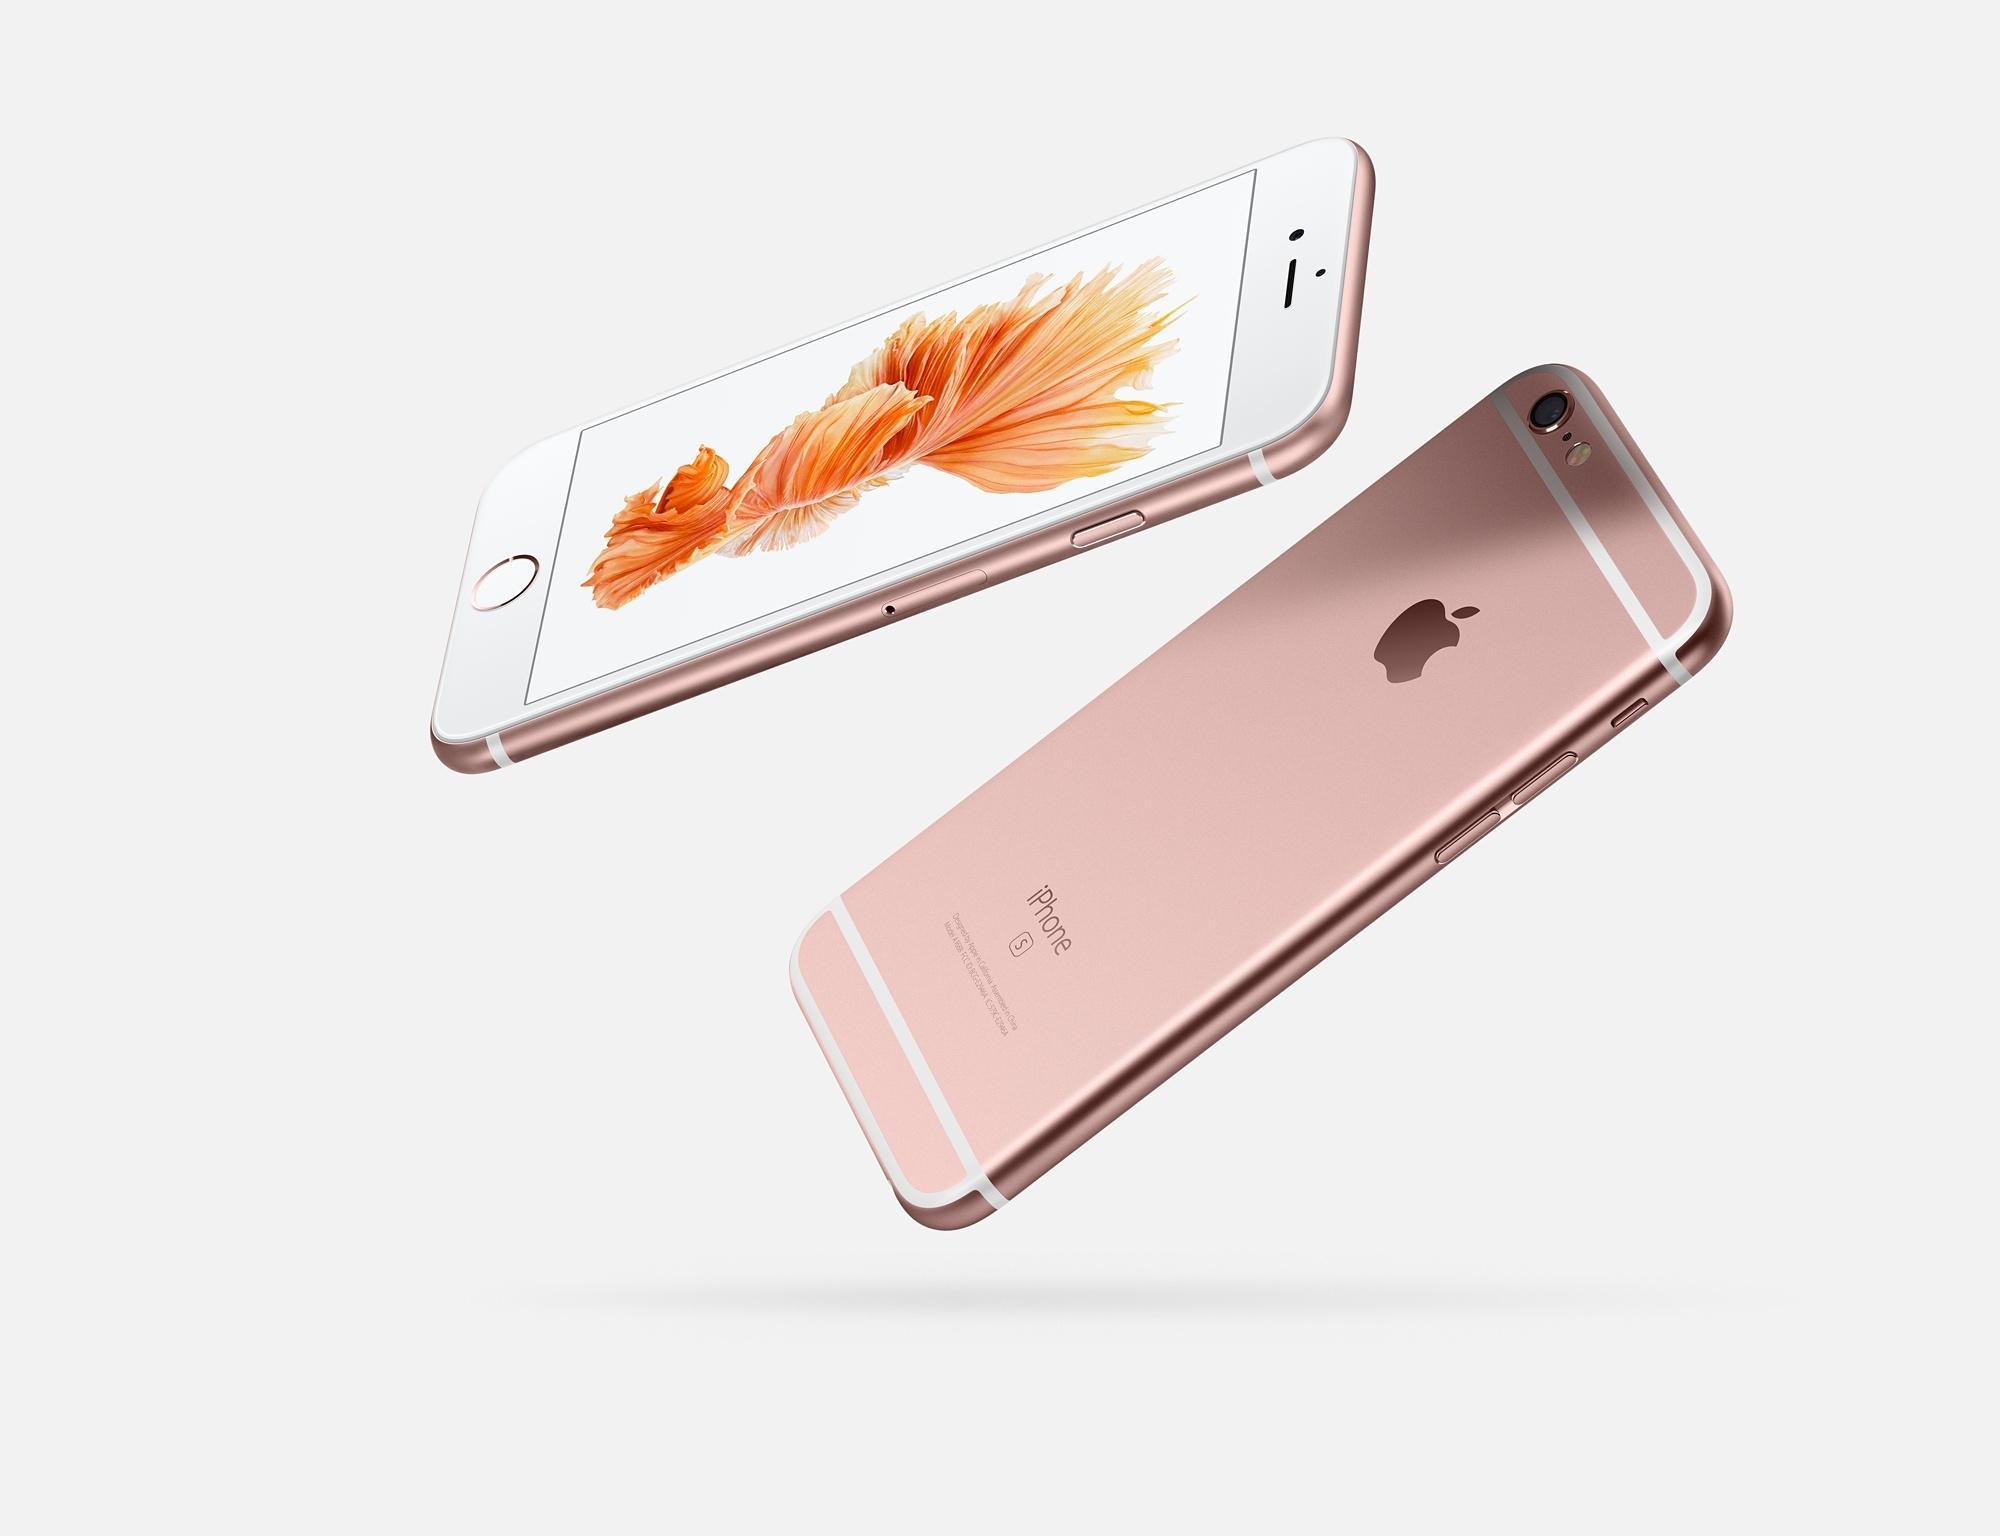 Iphone6S-дешевле некуда